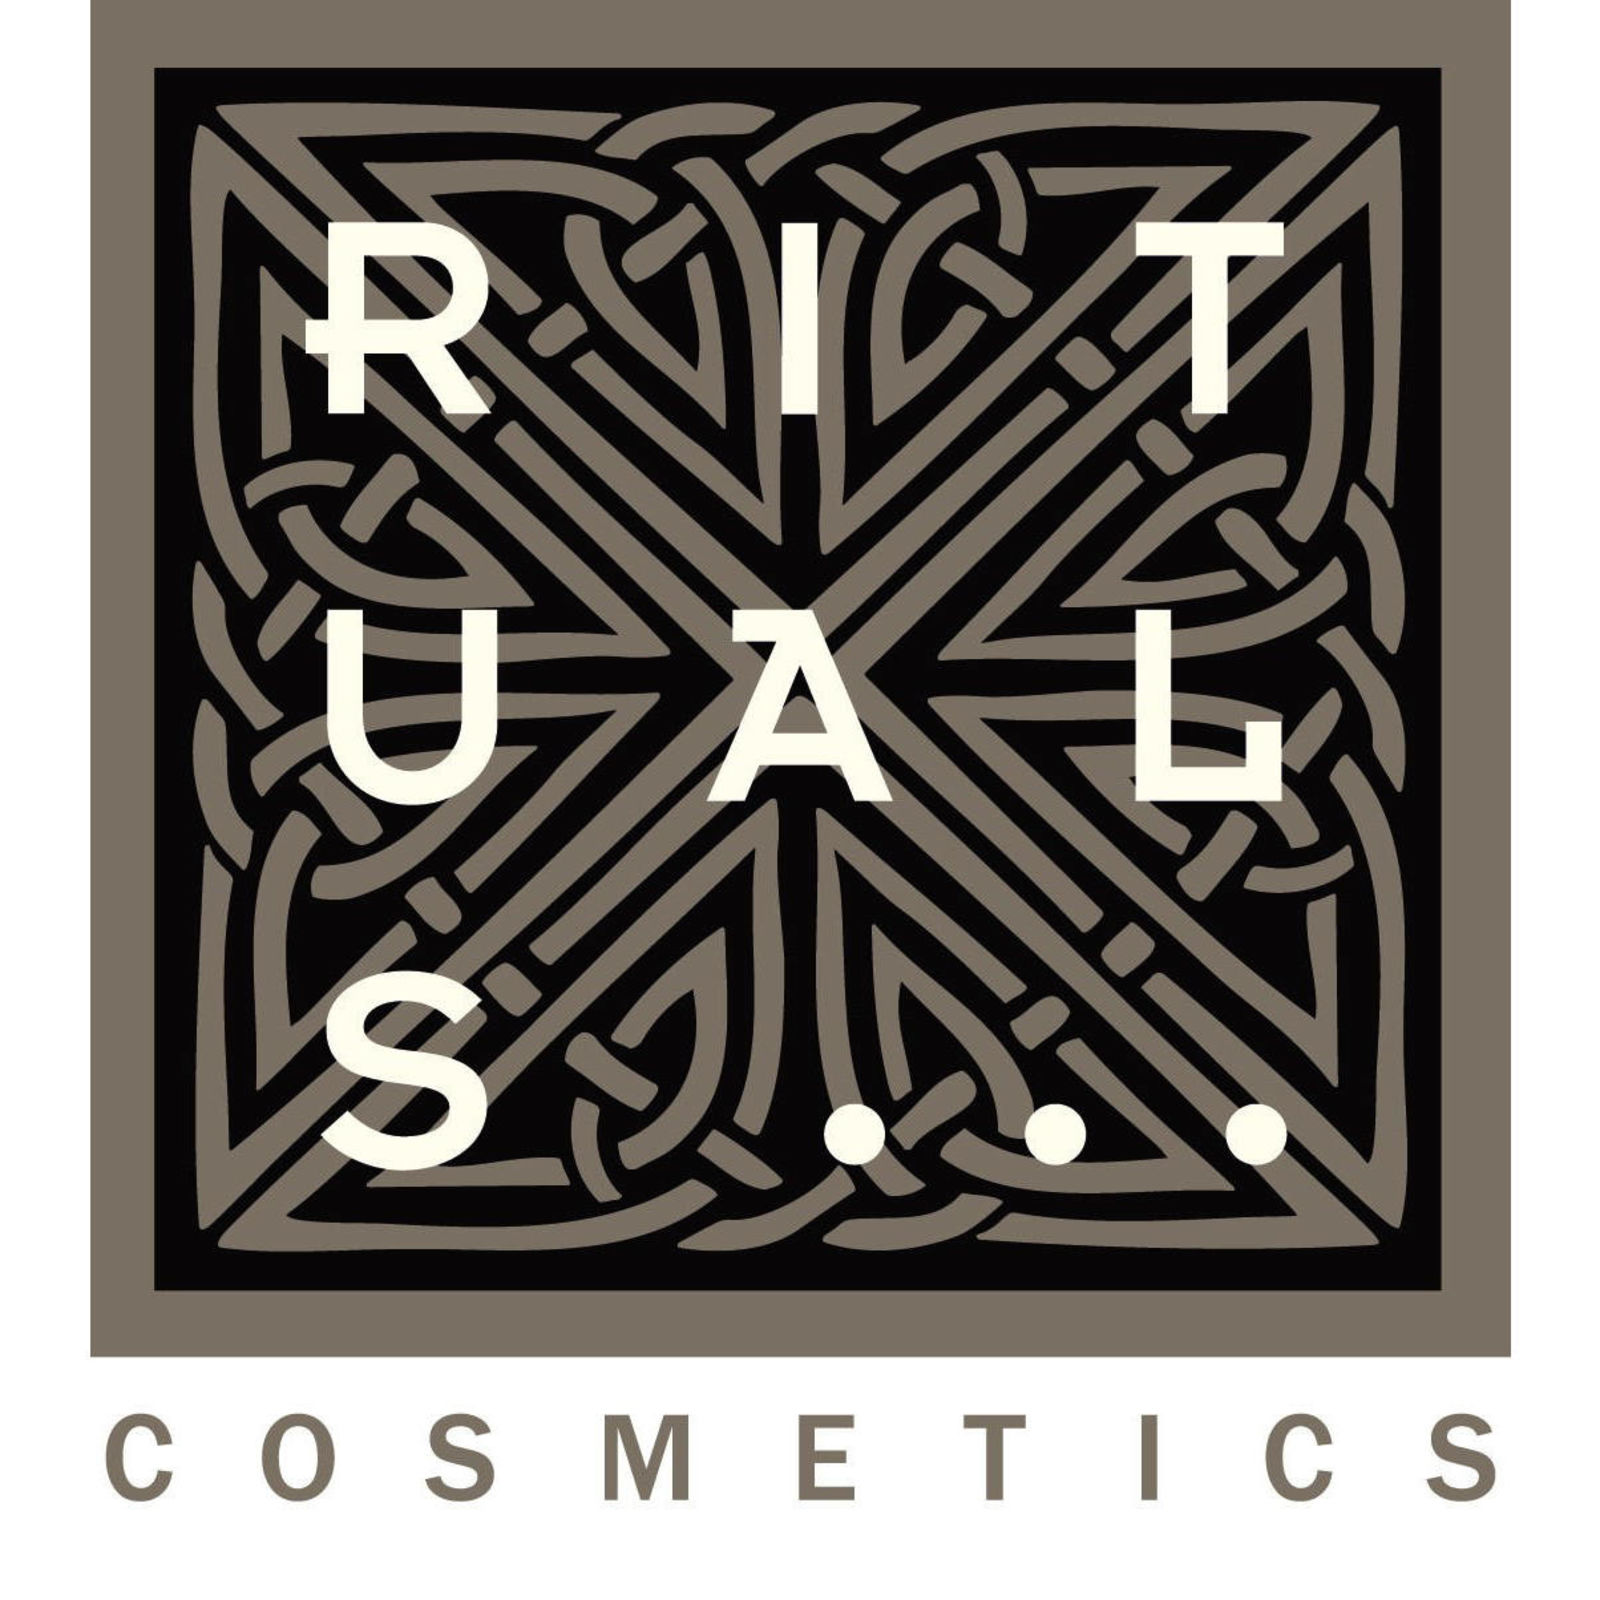 RITUALS cosmetics (Image 1)